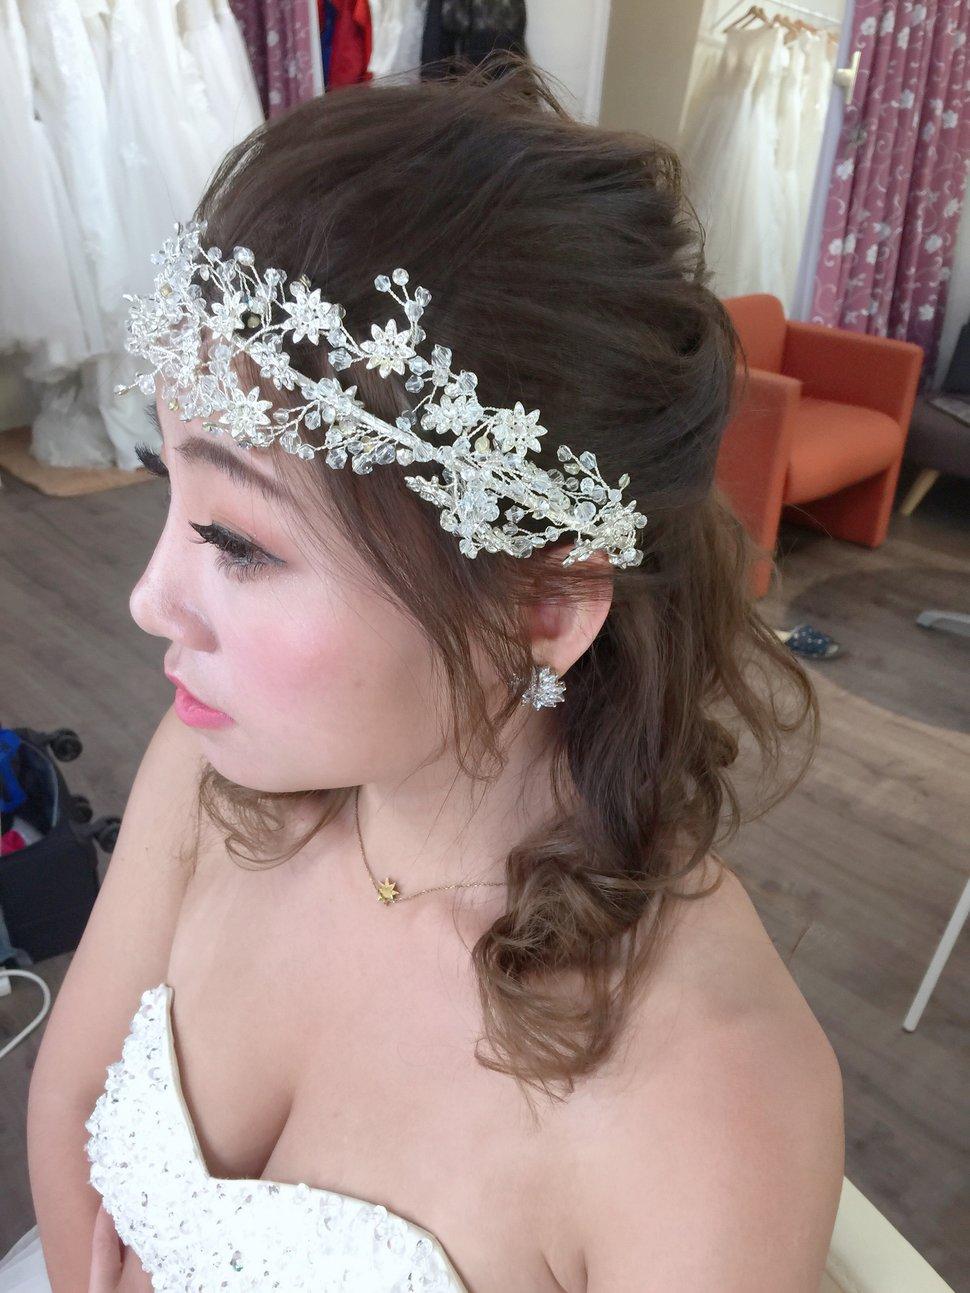 706F3737-2912-4F54-8673-455FA8297442 - Beauty愛美麗·整體造型 - 結婚吧